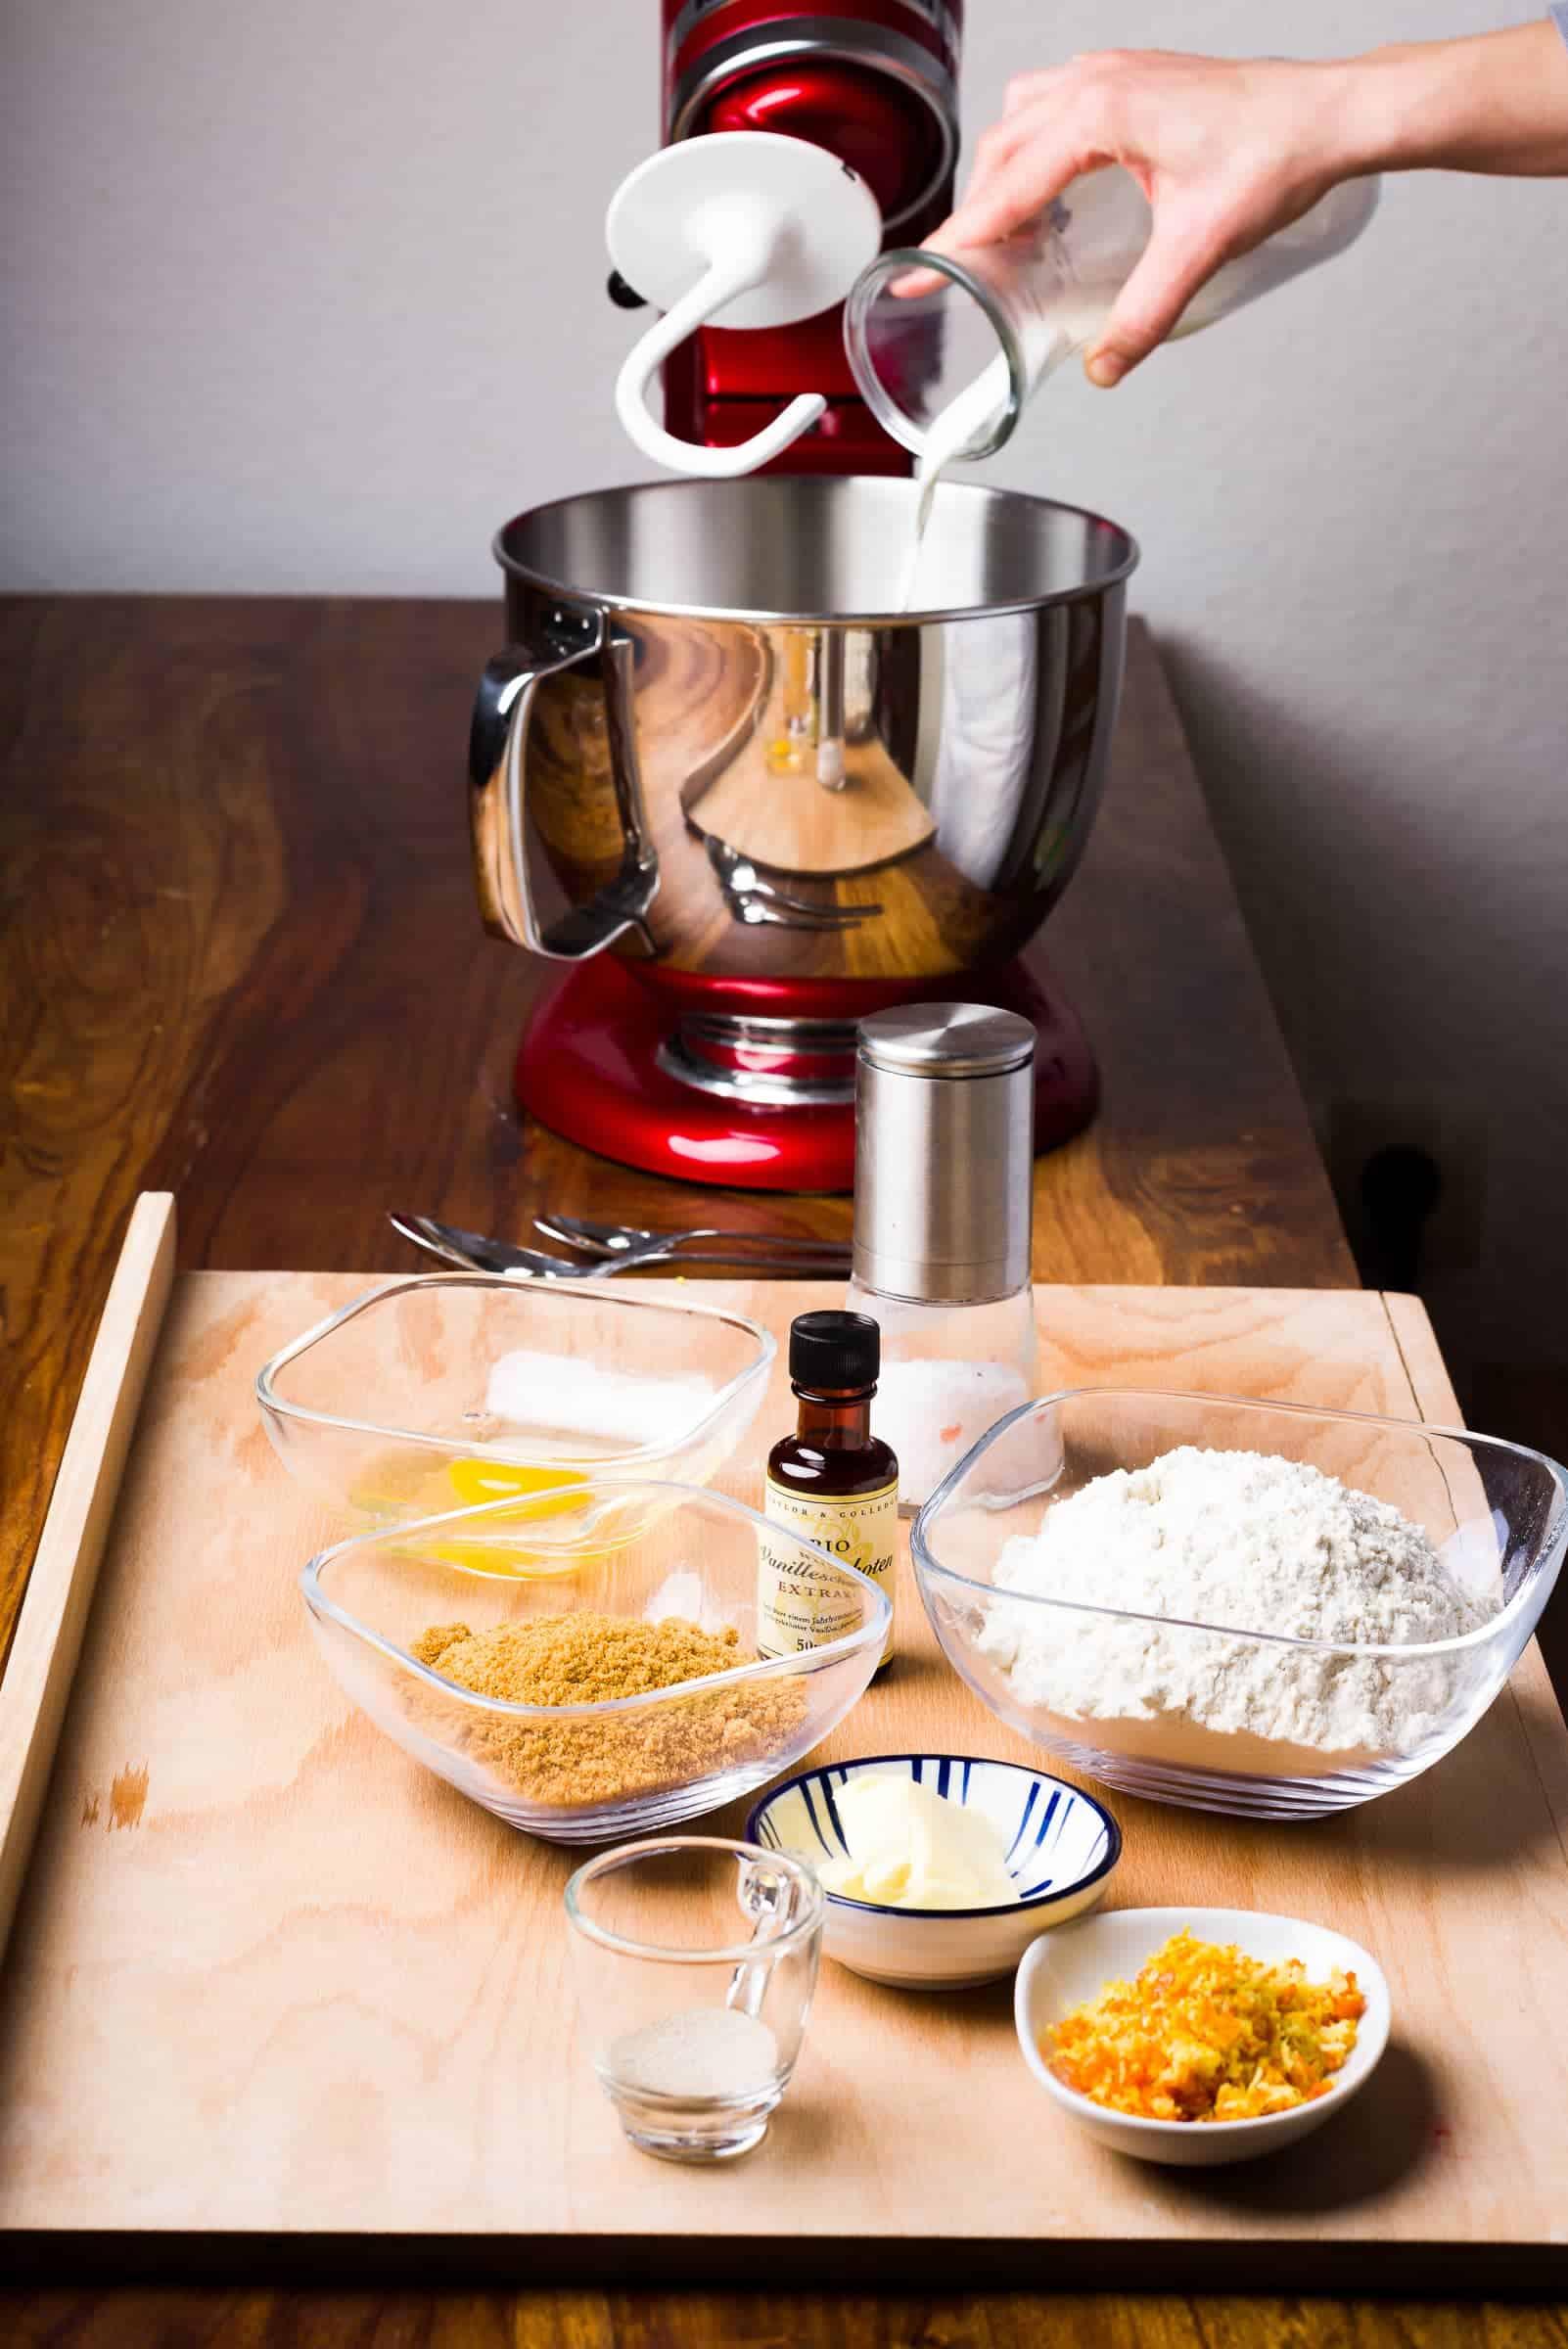 Arancini Marchigiani di carnevale ricetta GmamAm.com prep02